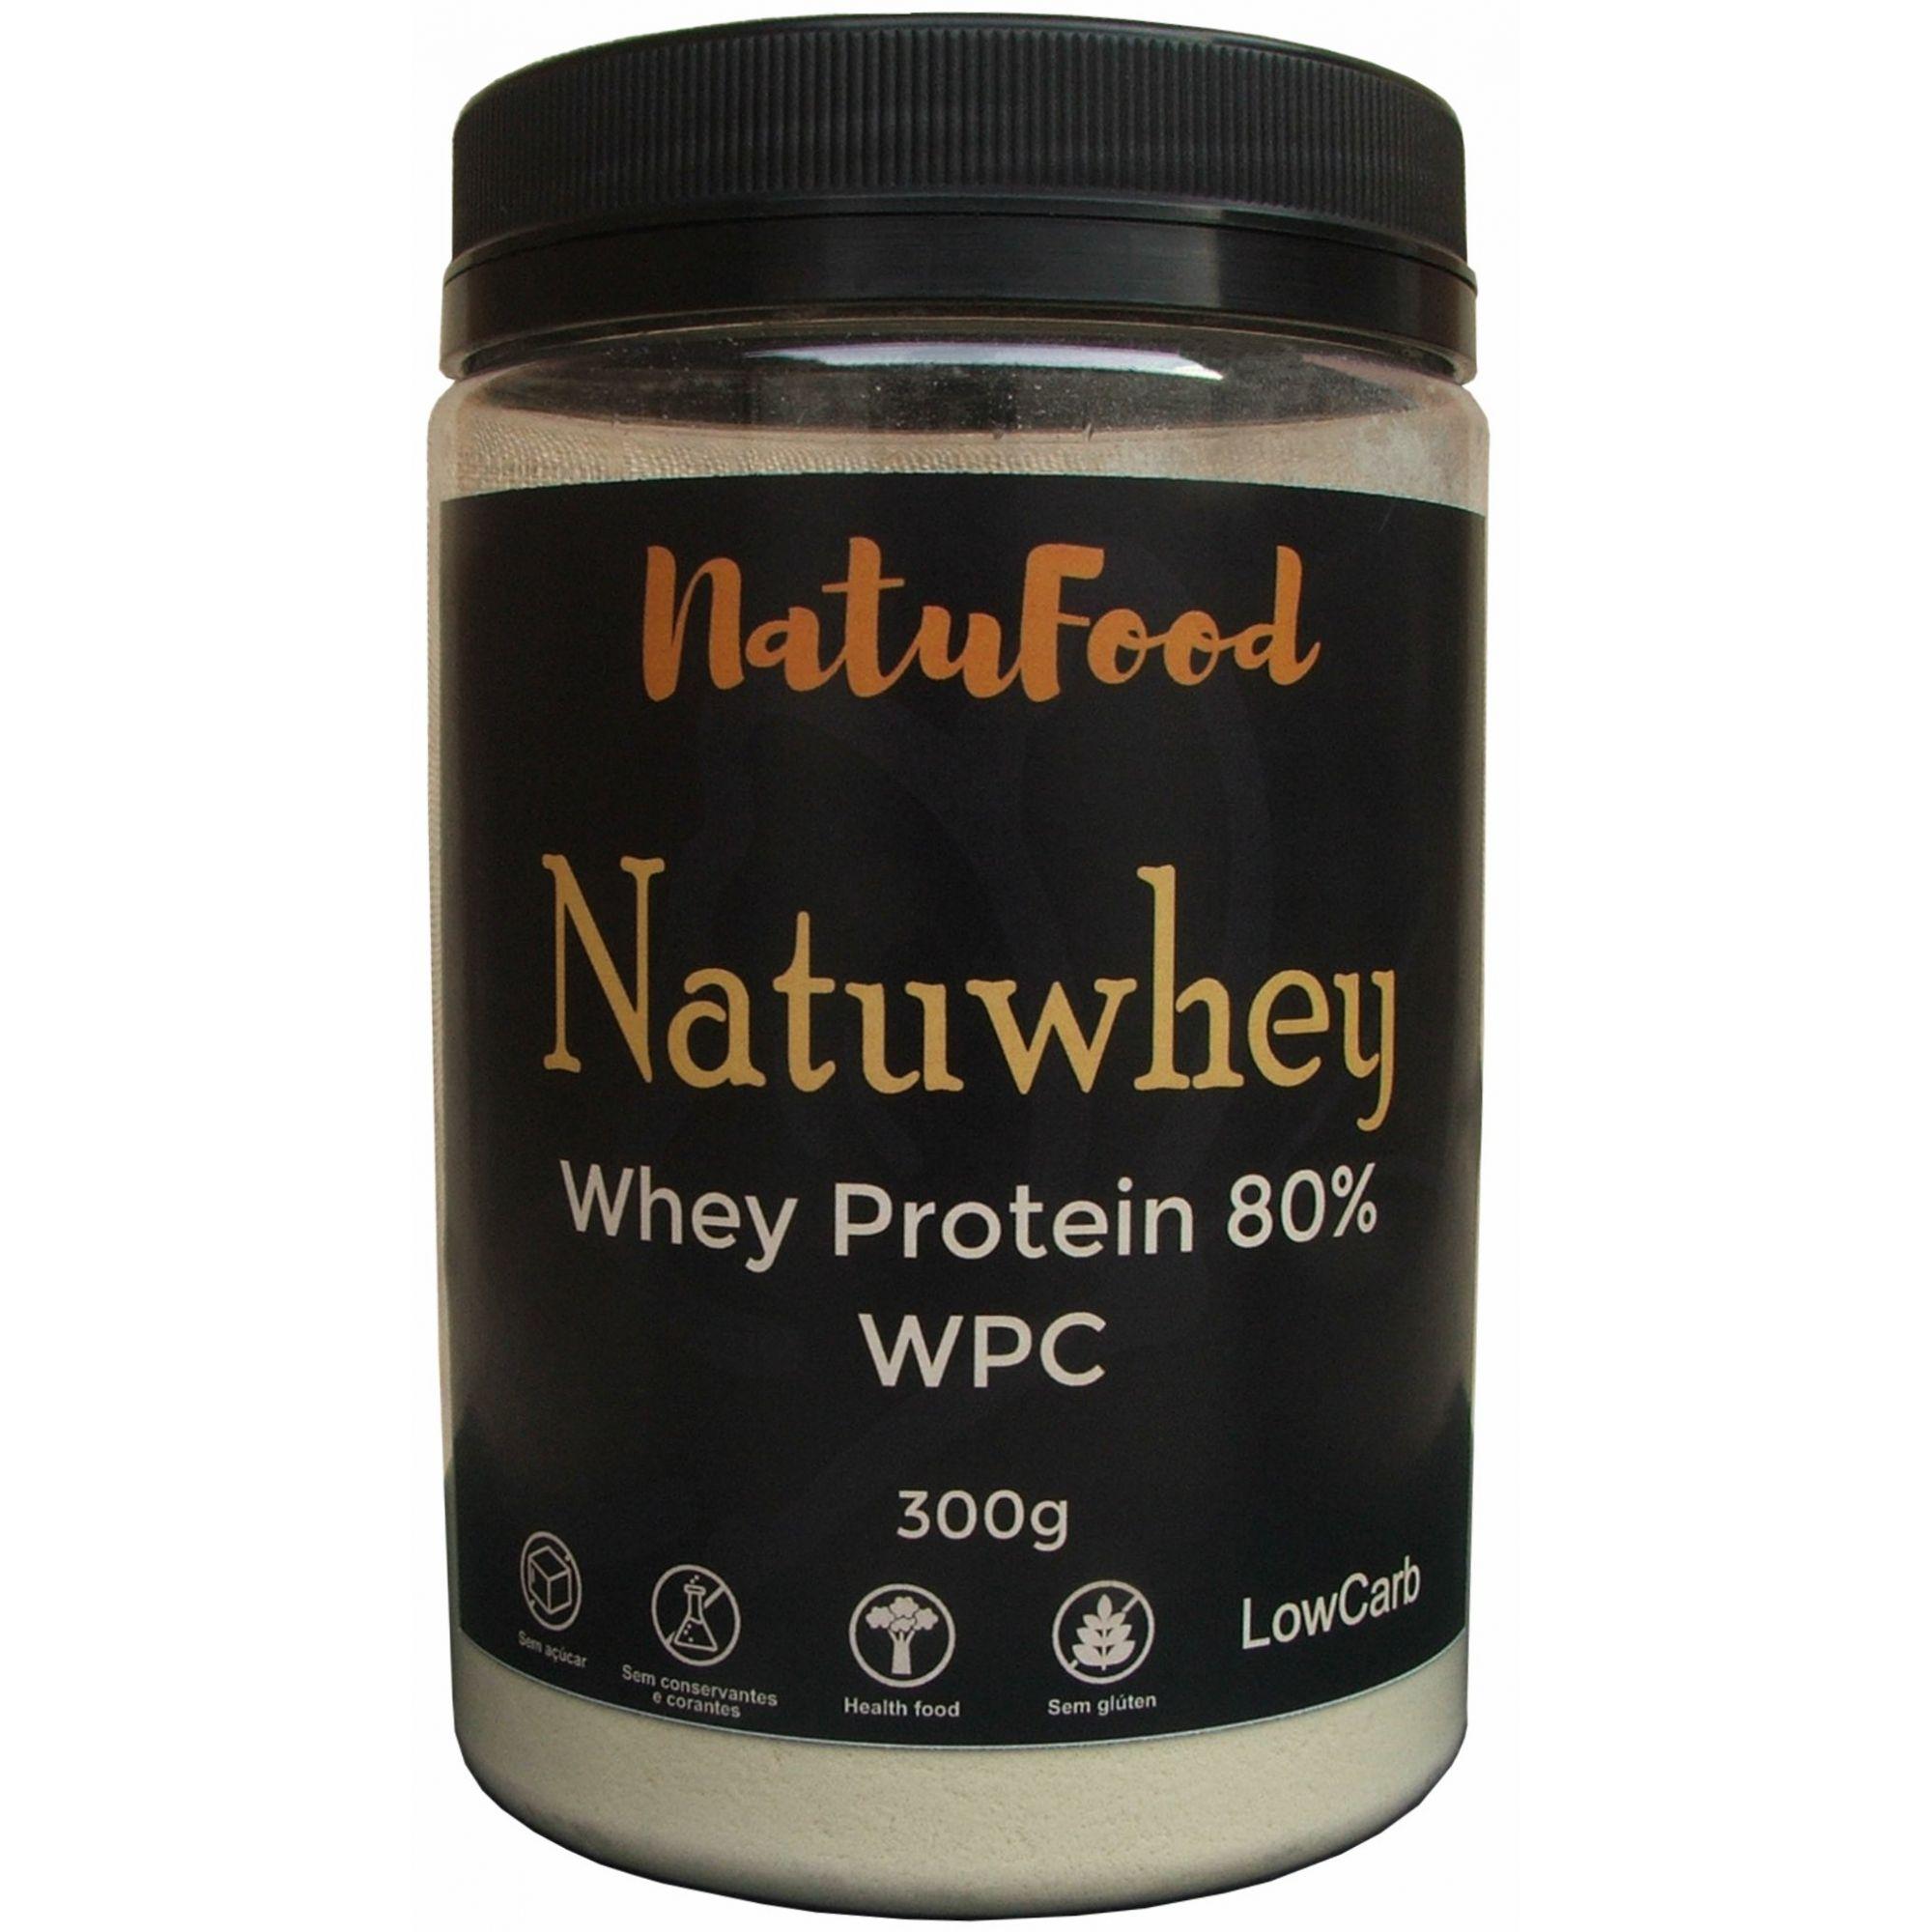 NATUWHEY CONCENTRADO 80%  - Natufood